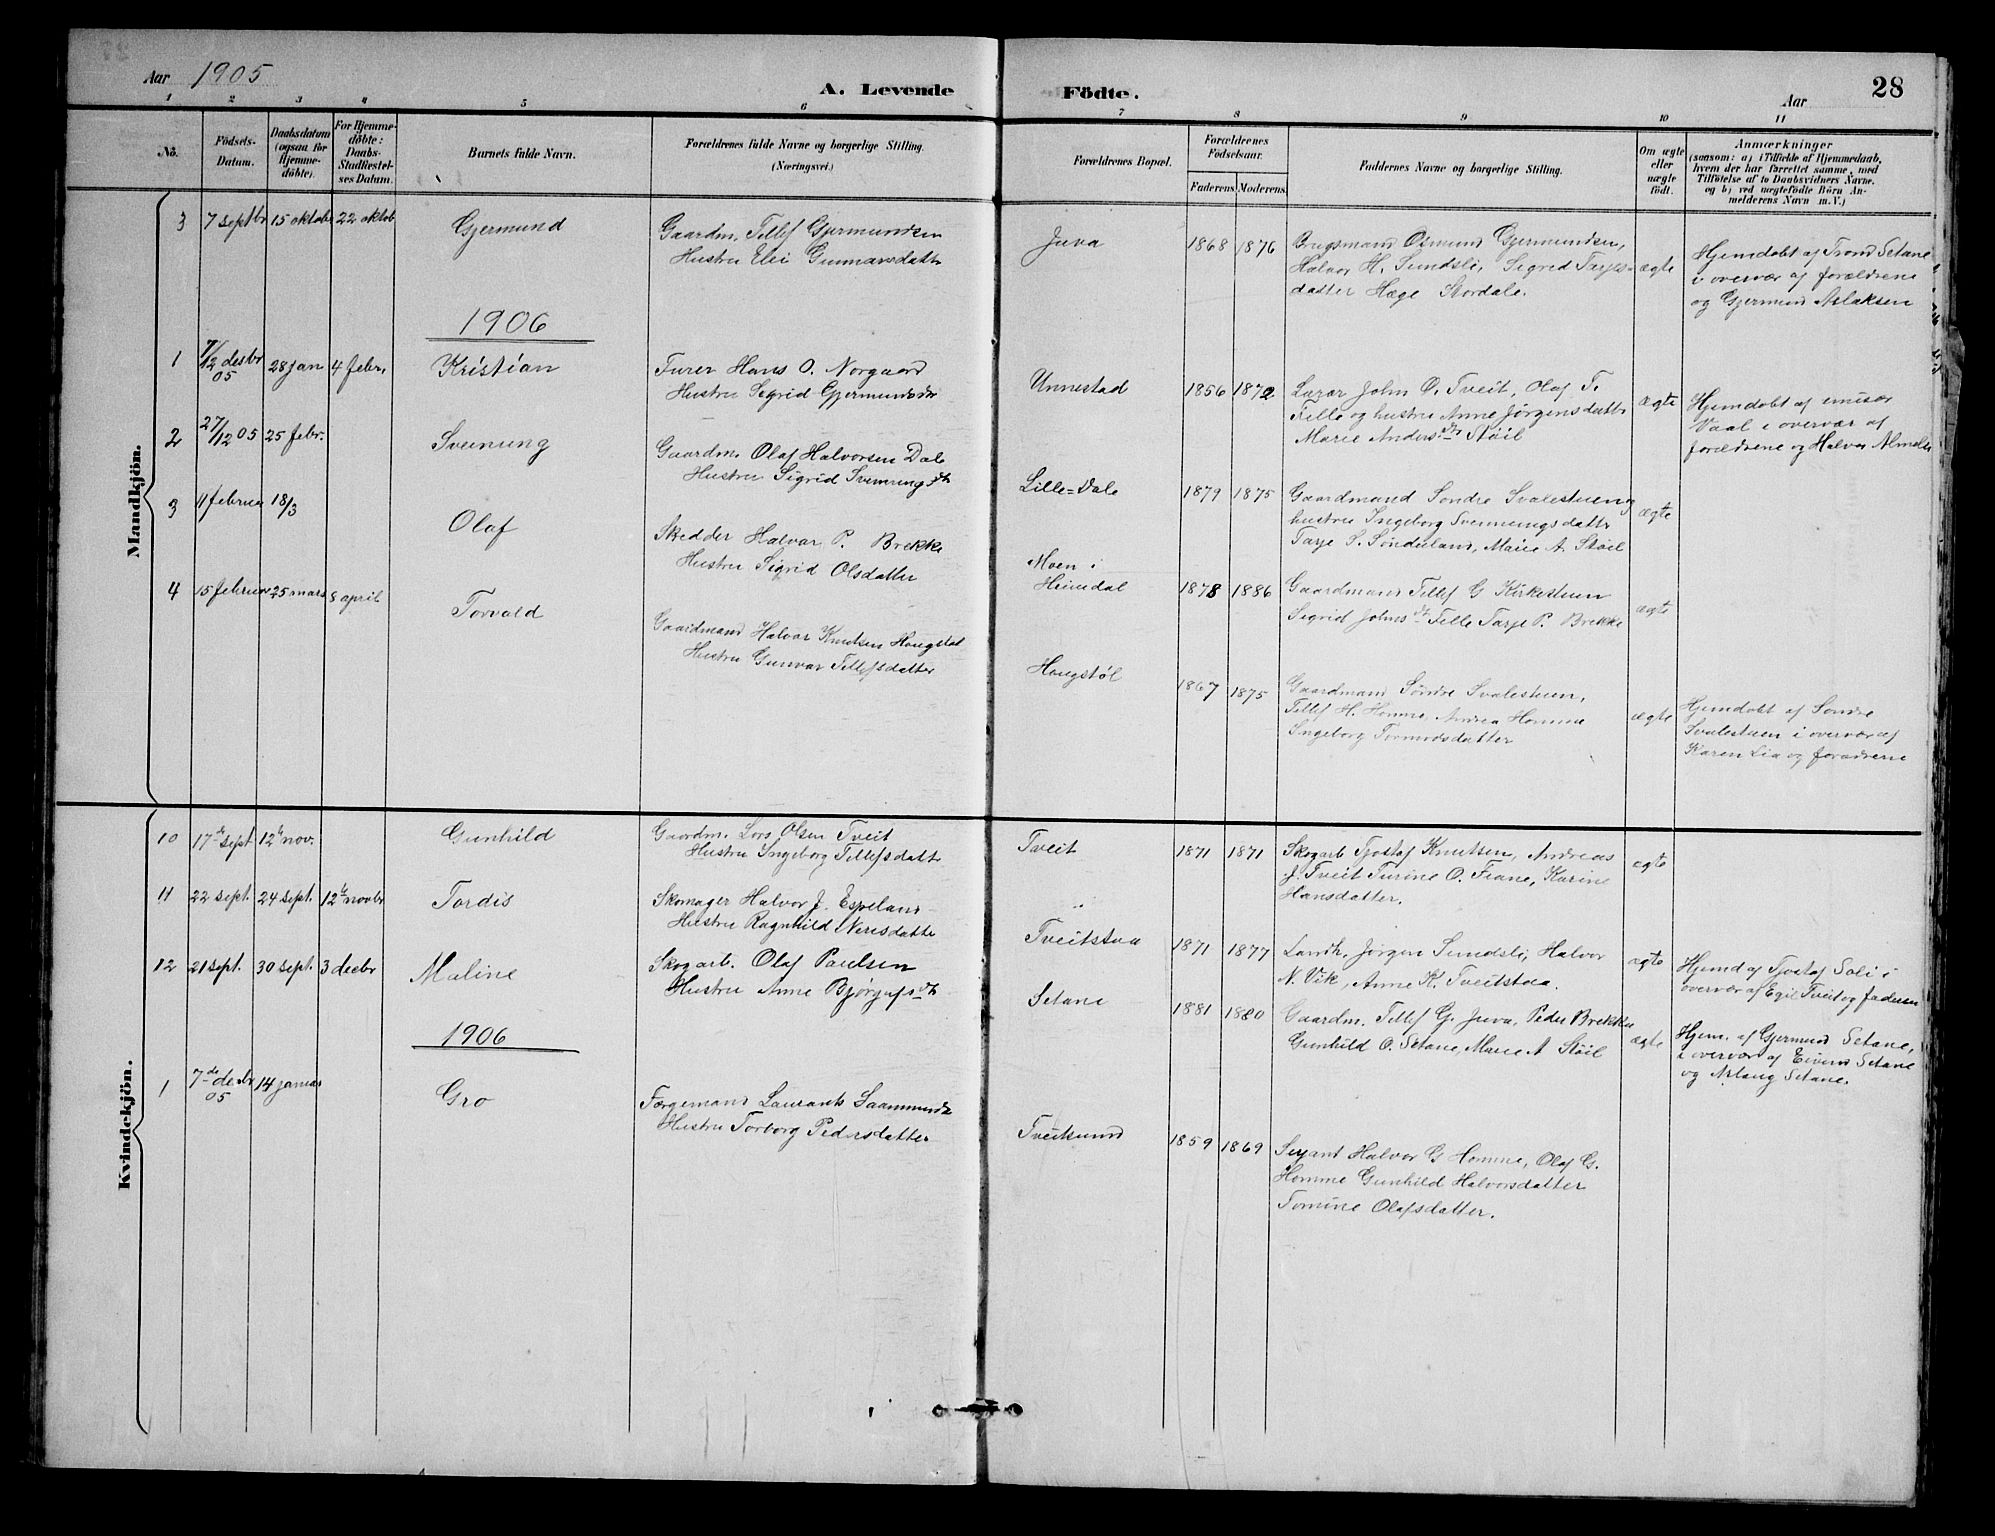 SAKO, Nissedal kirkebøker, G/Gb/L0003: Klokkerbok nr. II 3, 1893-1928, s. 28